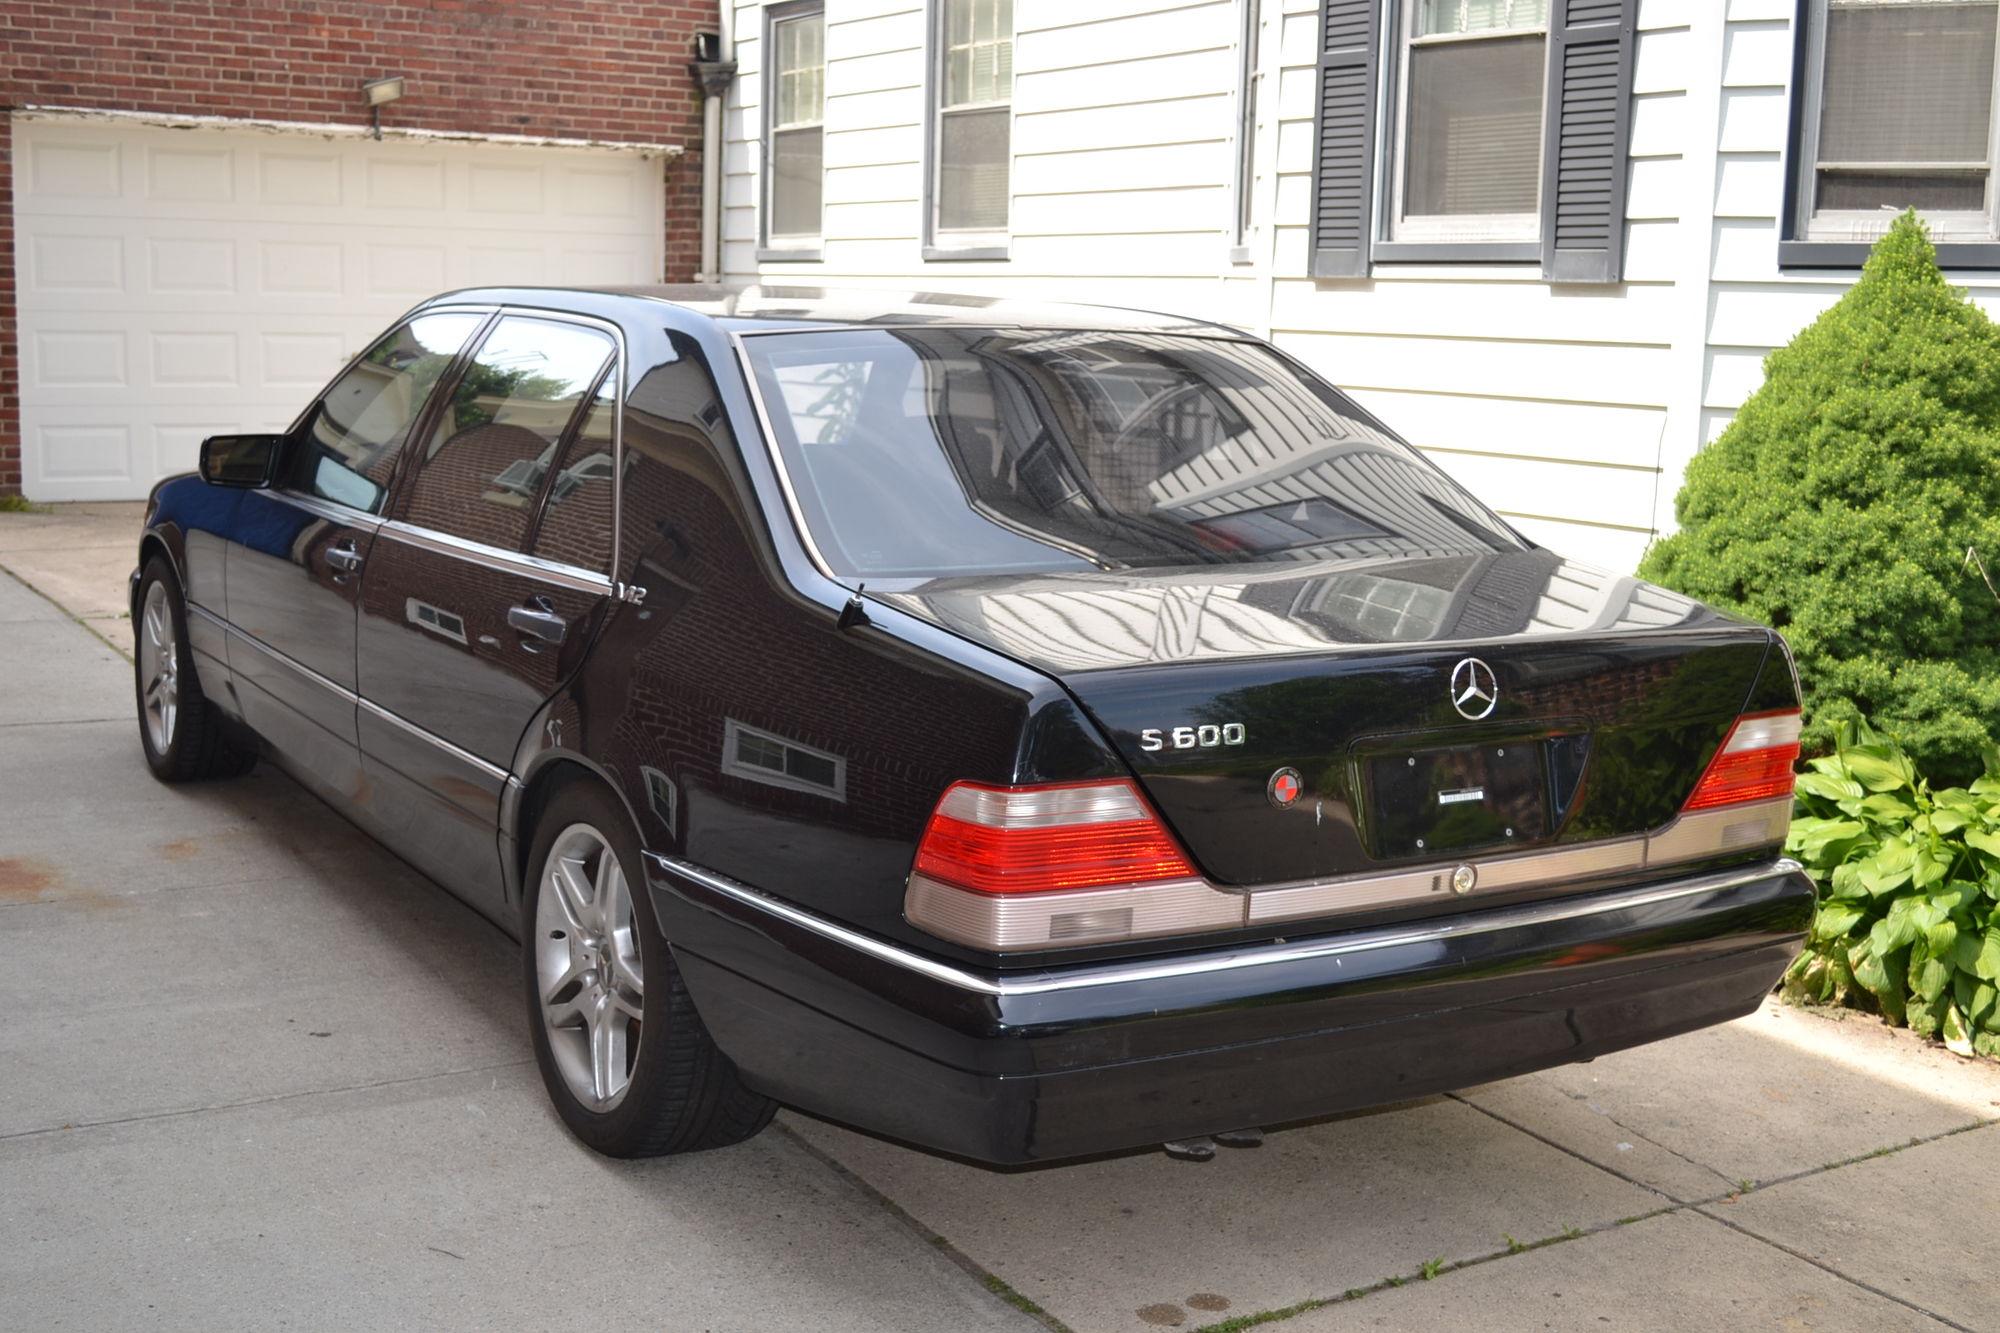 Mercedes s 600 киев 7500$